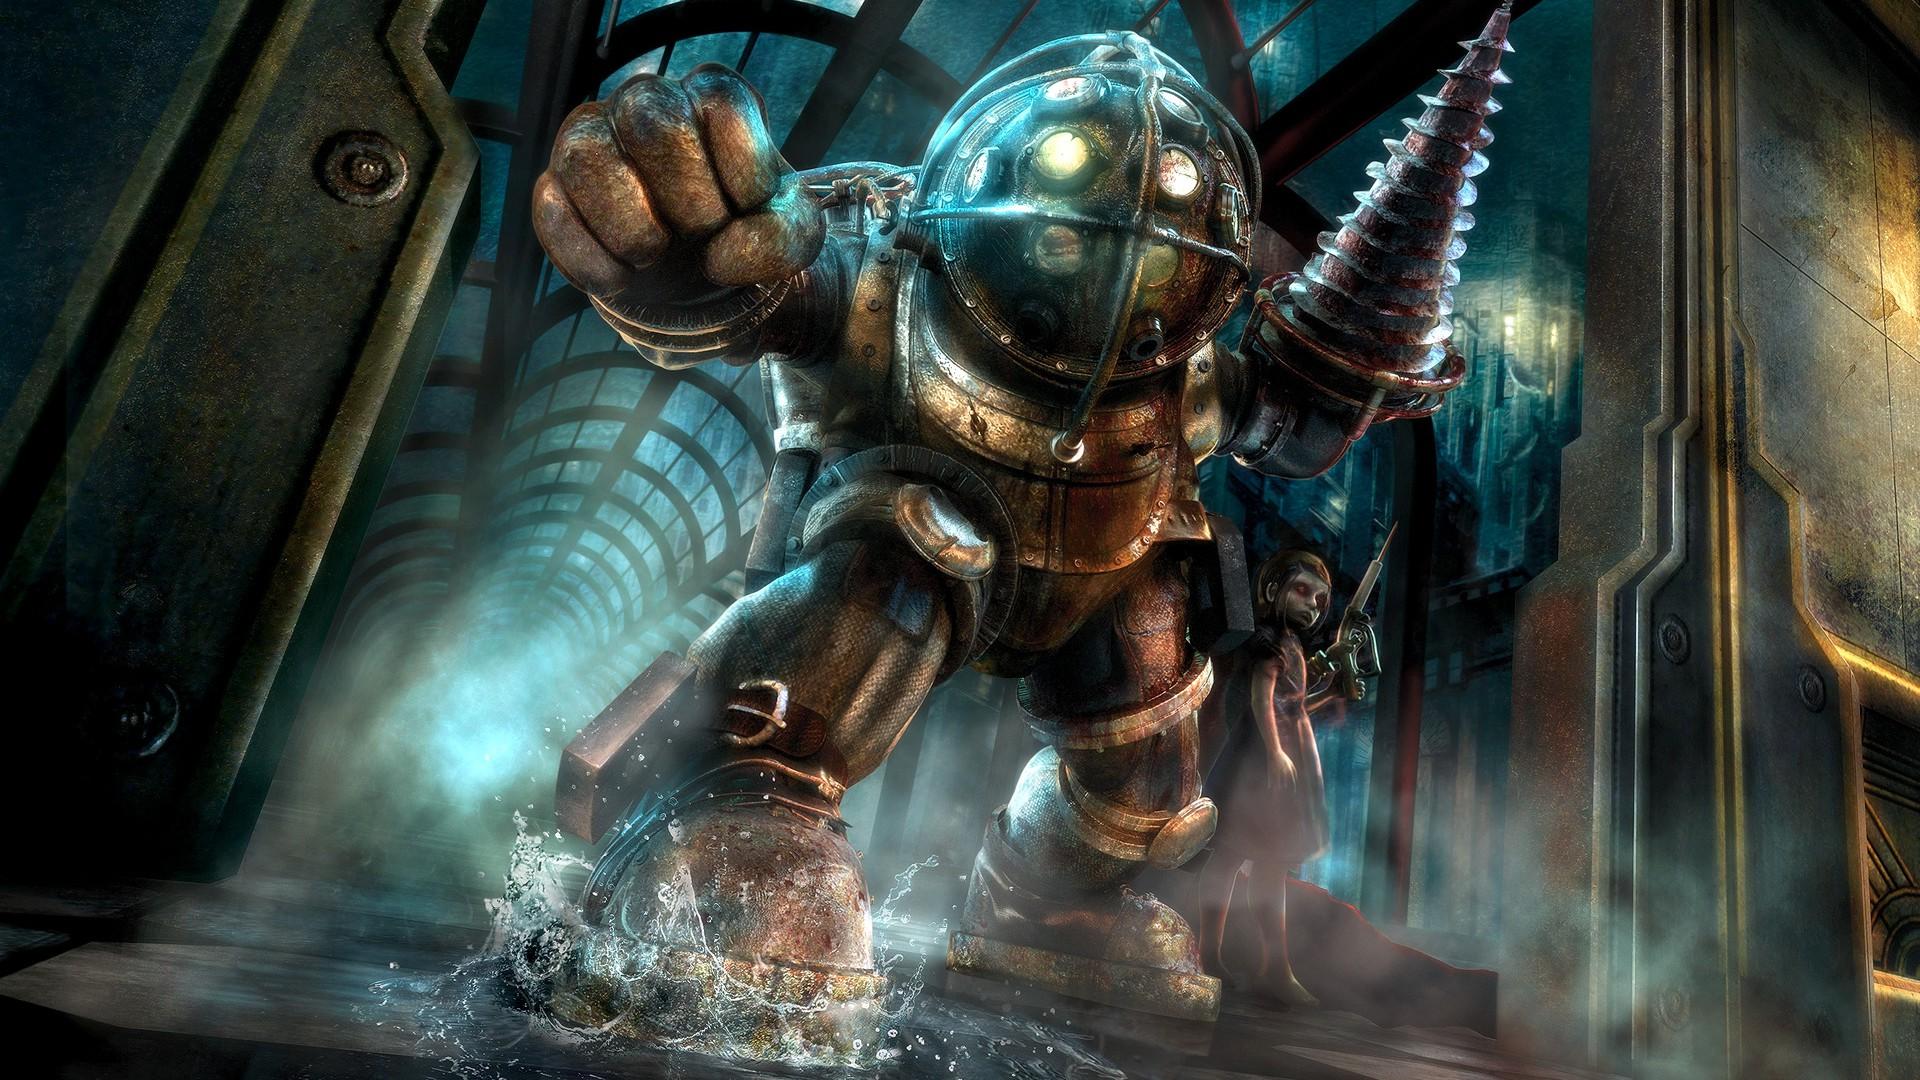 video games sea Big Daddy BioShock Rapture mythology Little Sister screenshot 1920x1080 px computer wallpaper pc game 715348